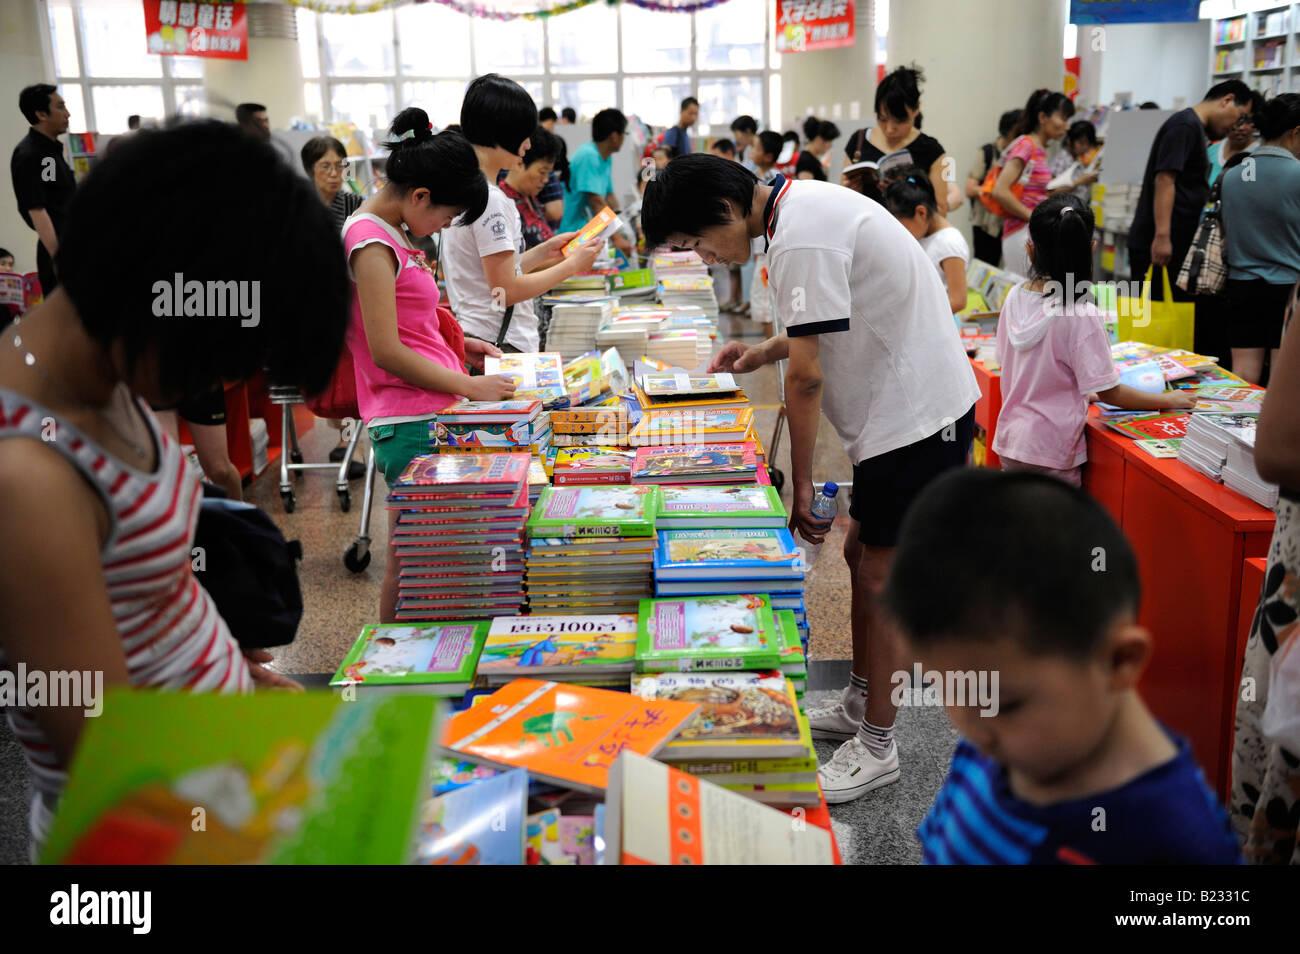 Peope reading in Wangfujing Bookstore in Beijing, China. 12-Jul-2008 - Stock Image